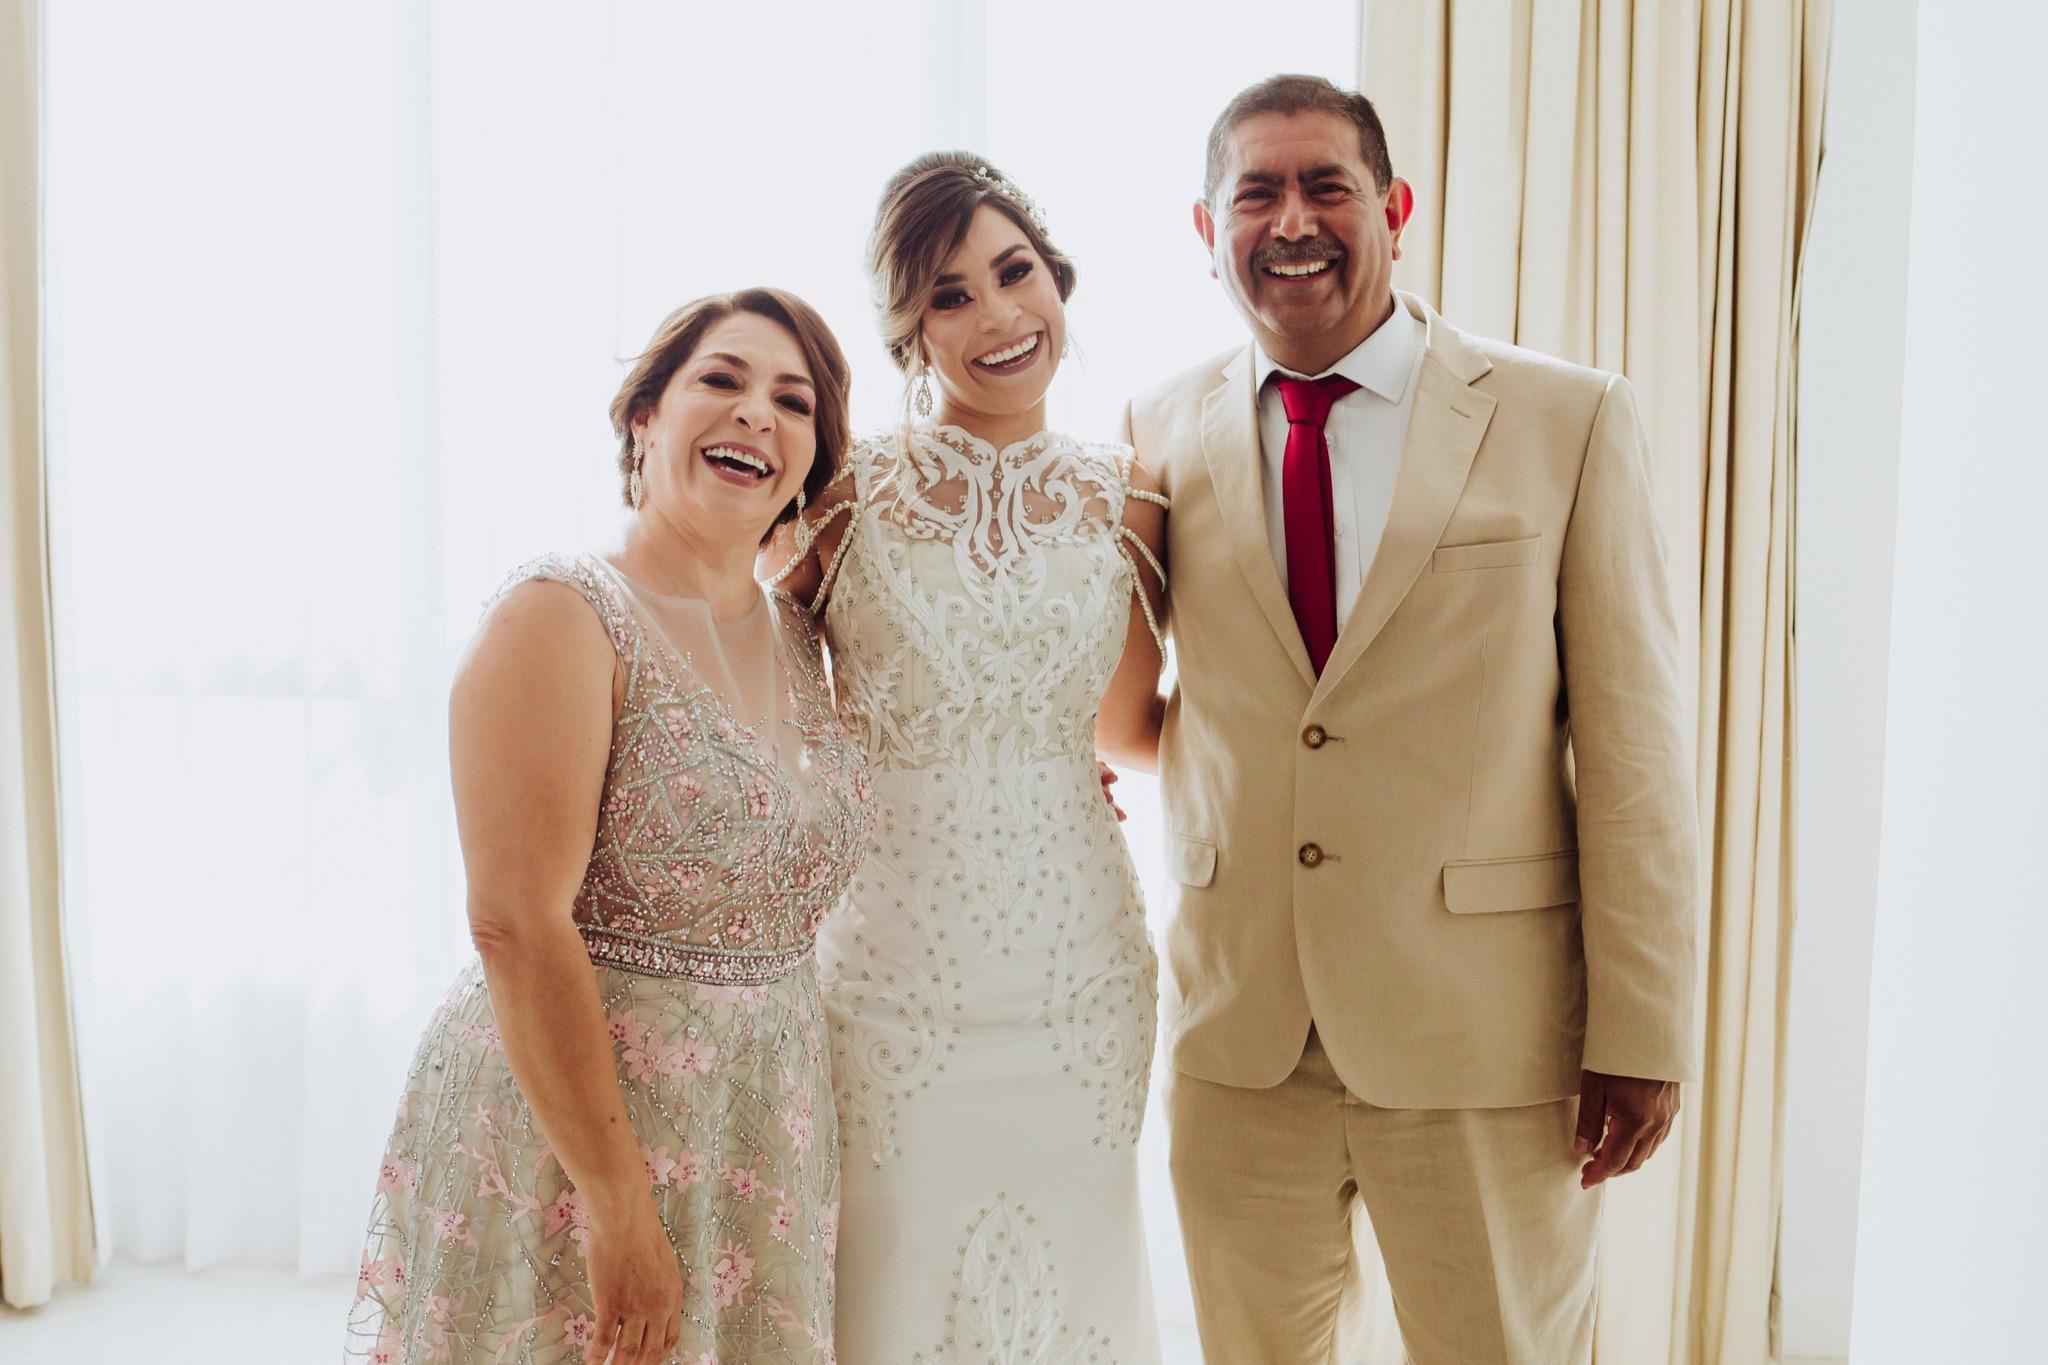 Javier_noriega_fotografo_bodas_profesional_zacatecas_mexico_mazatlan_sinaloa_photographer_weddings15